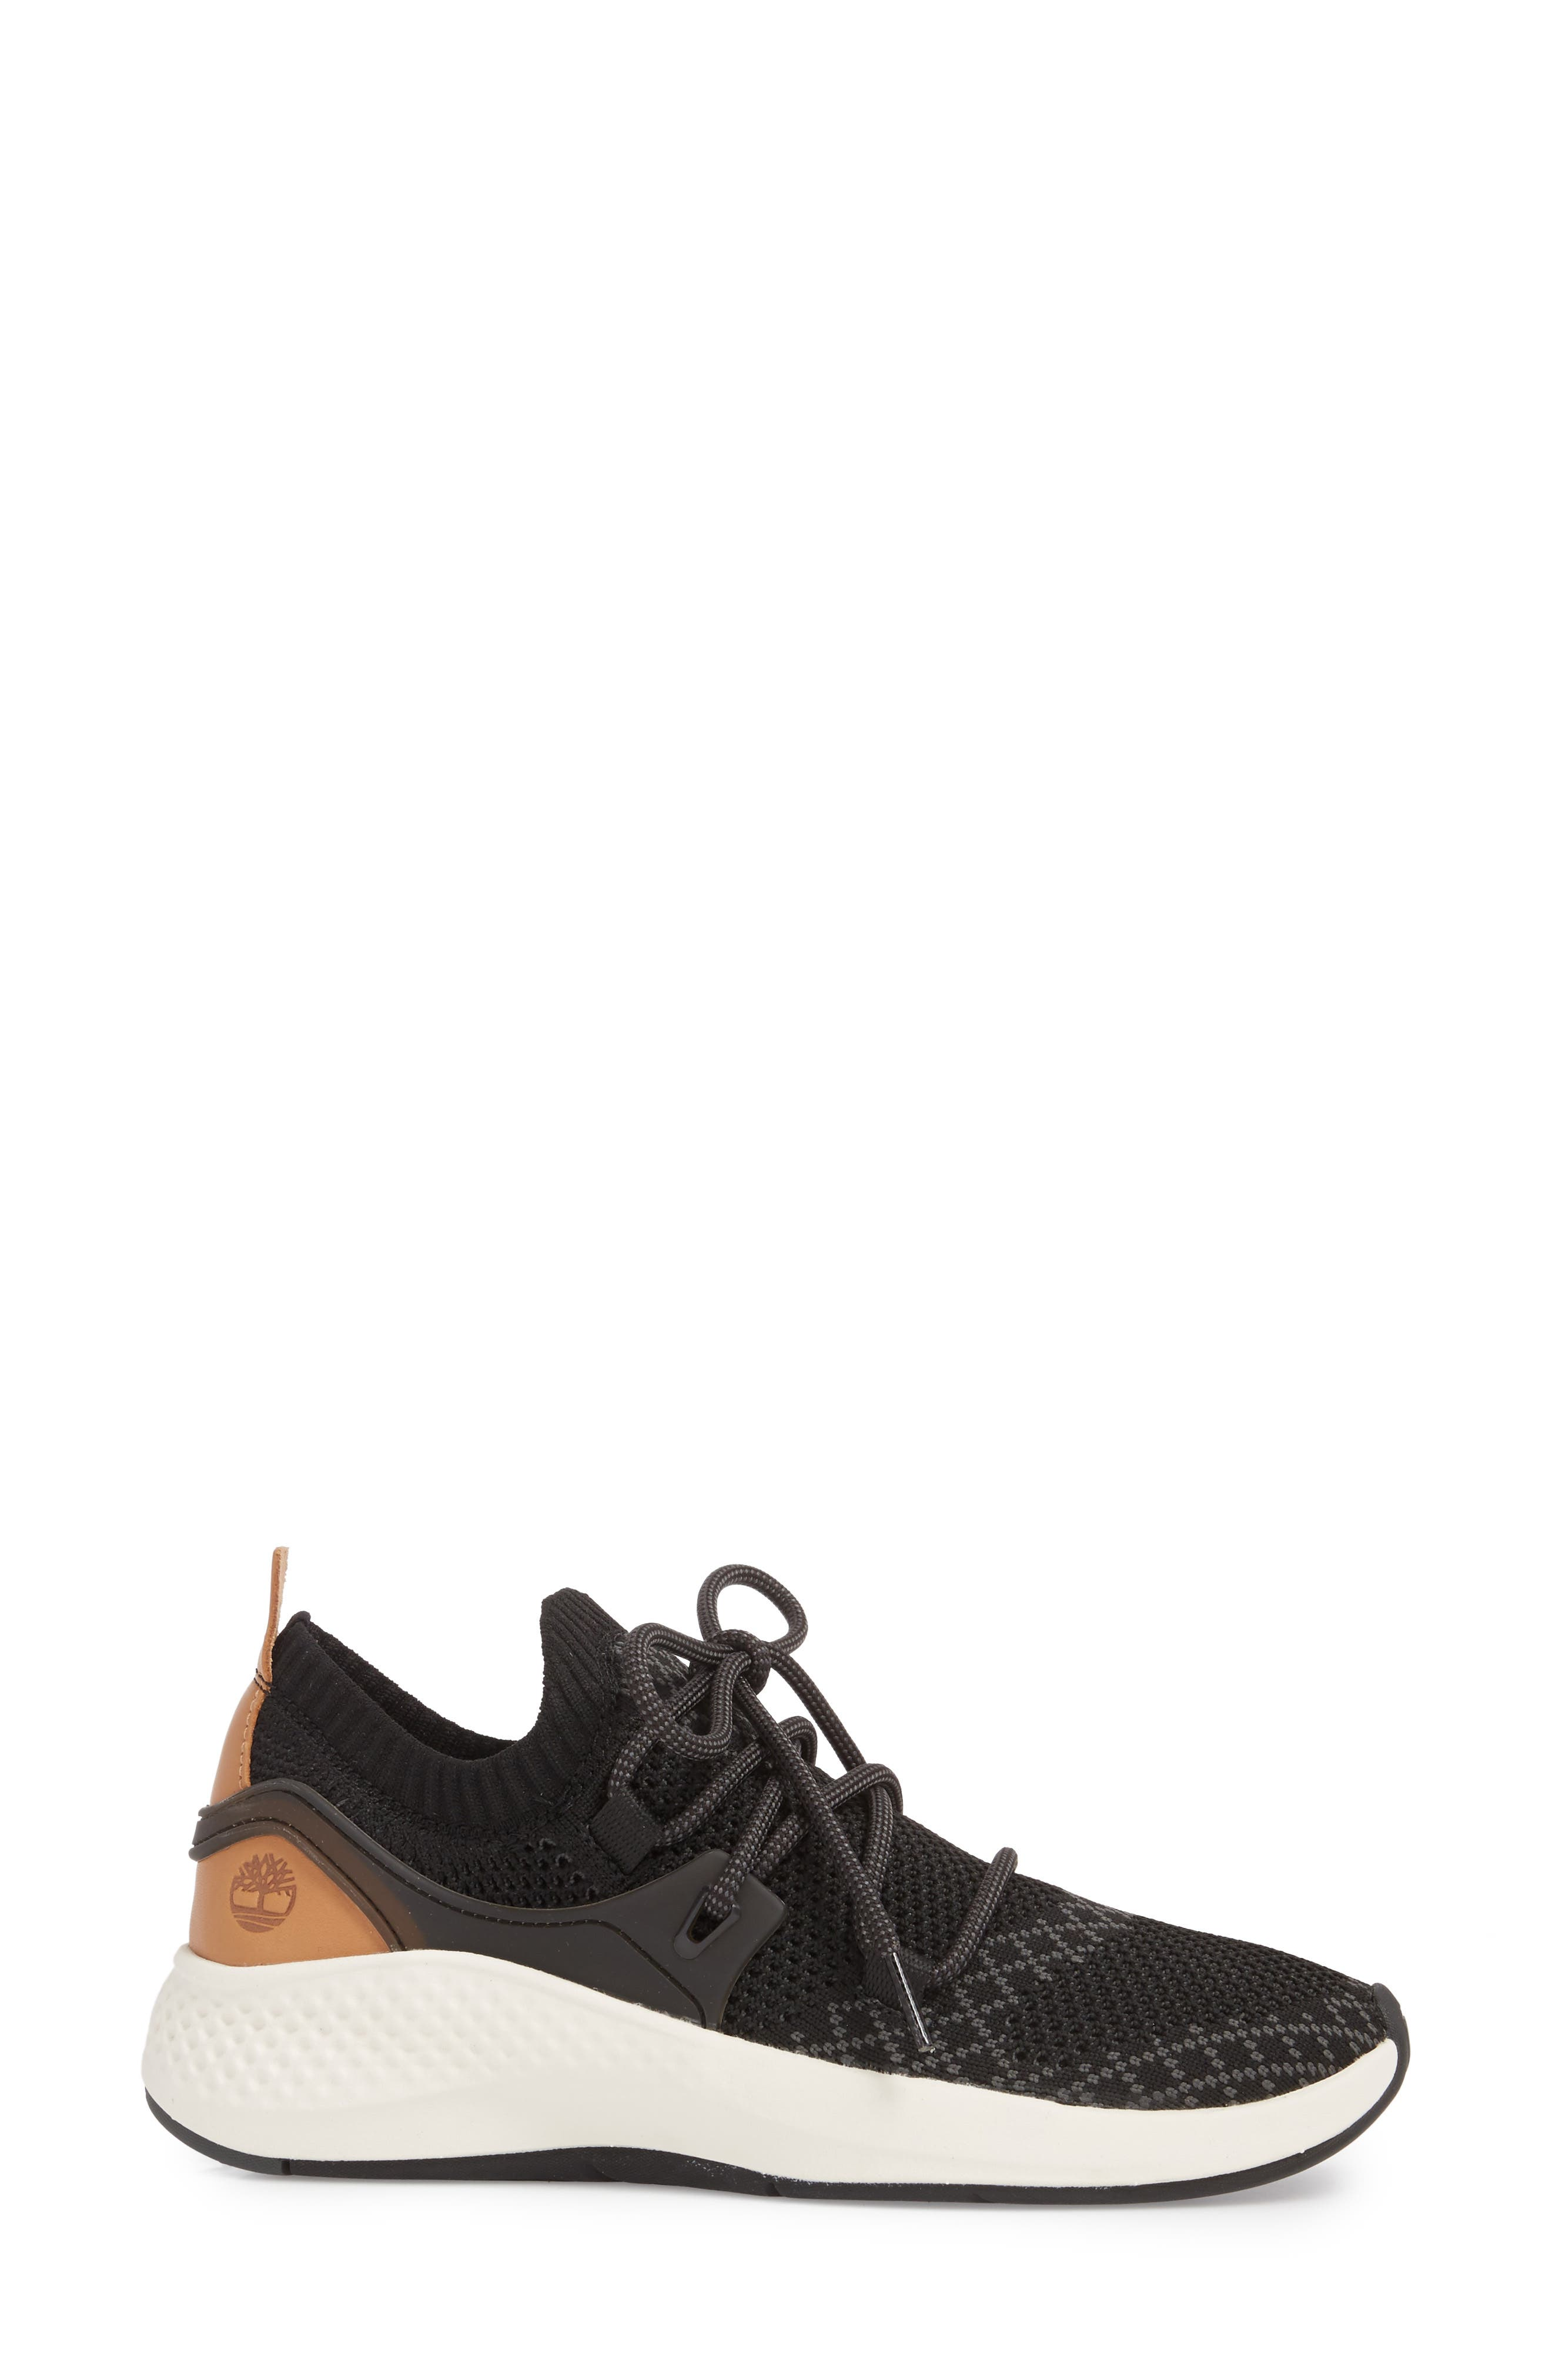 FlyRoam Go Knit Sneaker,                             Alternate thumbnail 3, color,                             Black Fabric